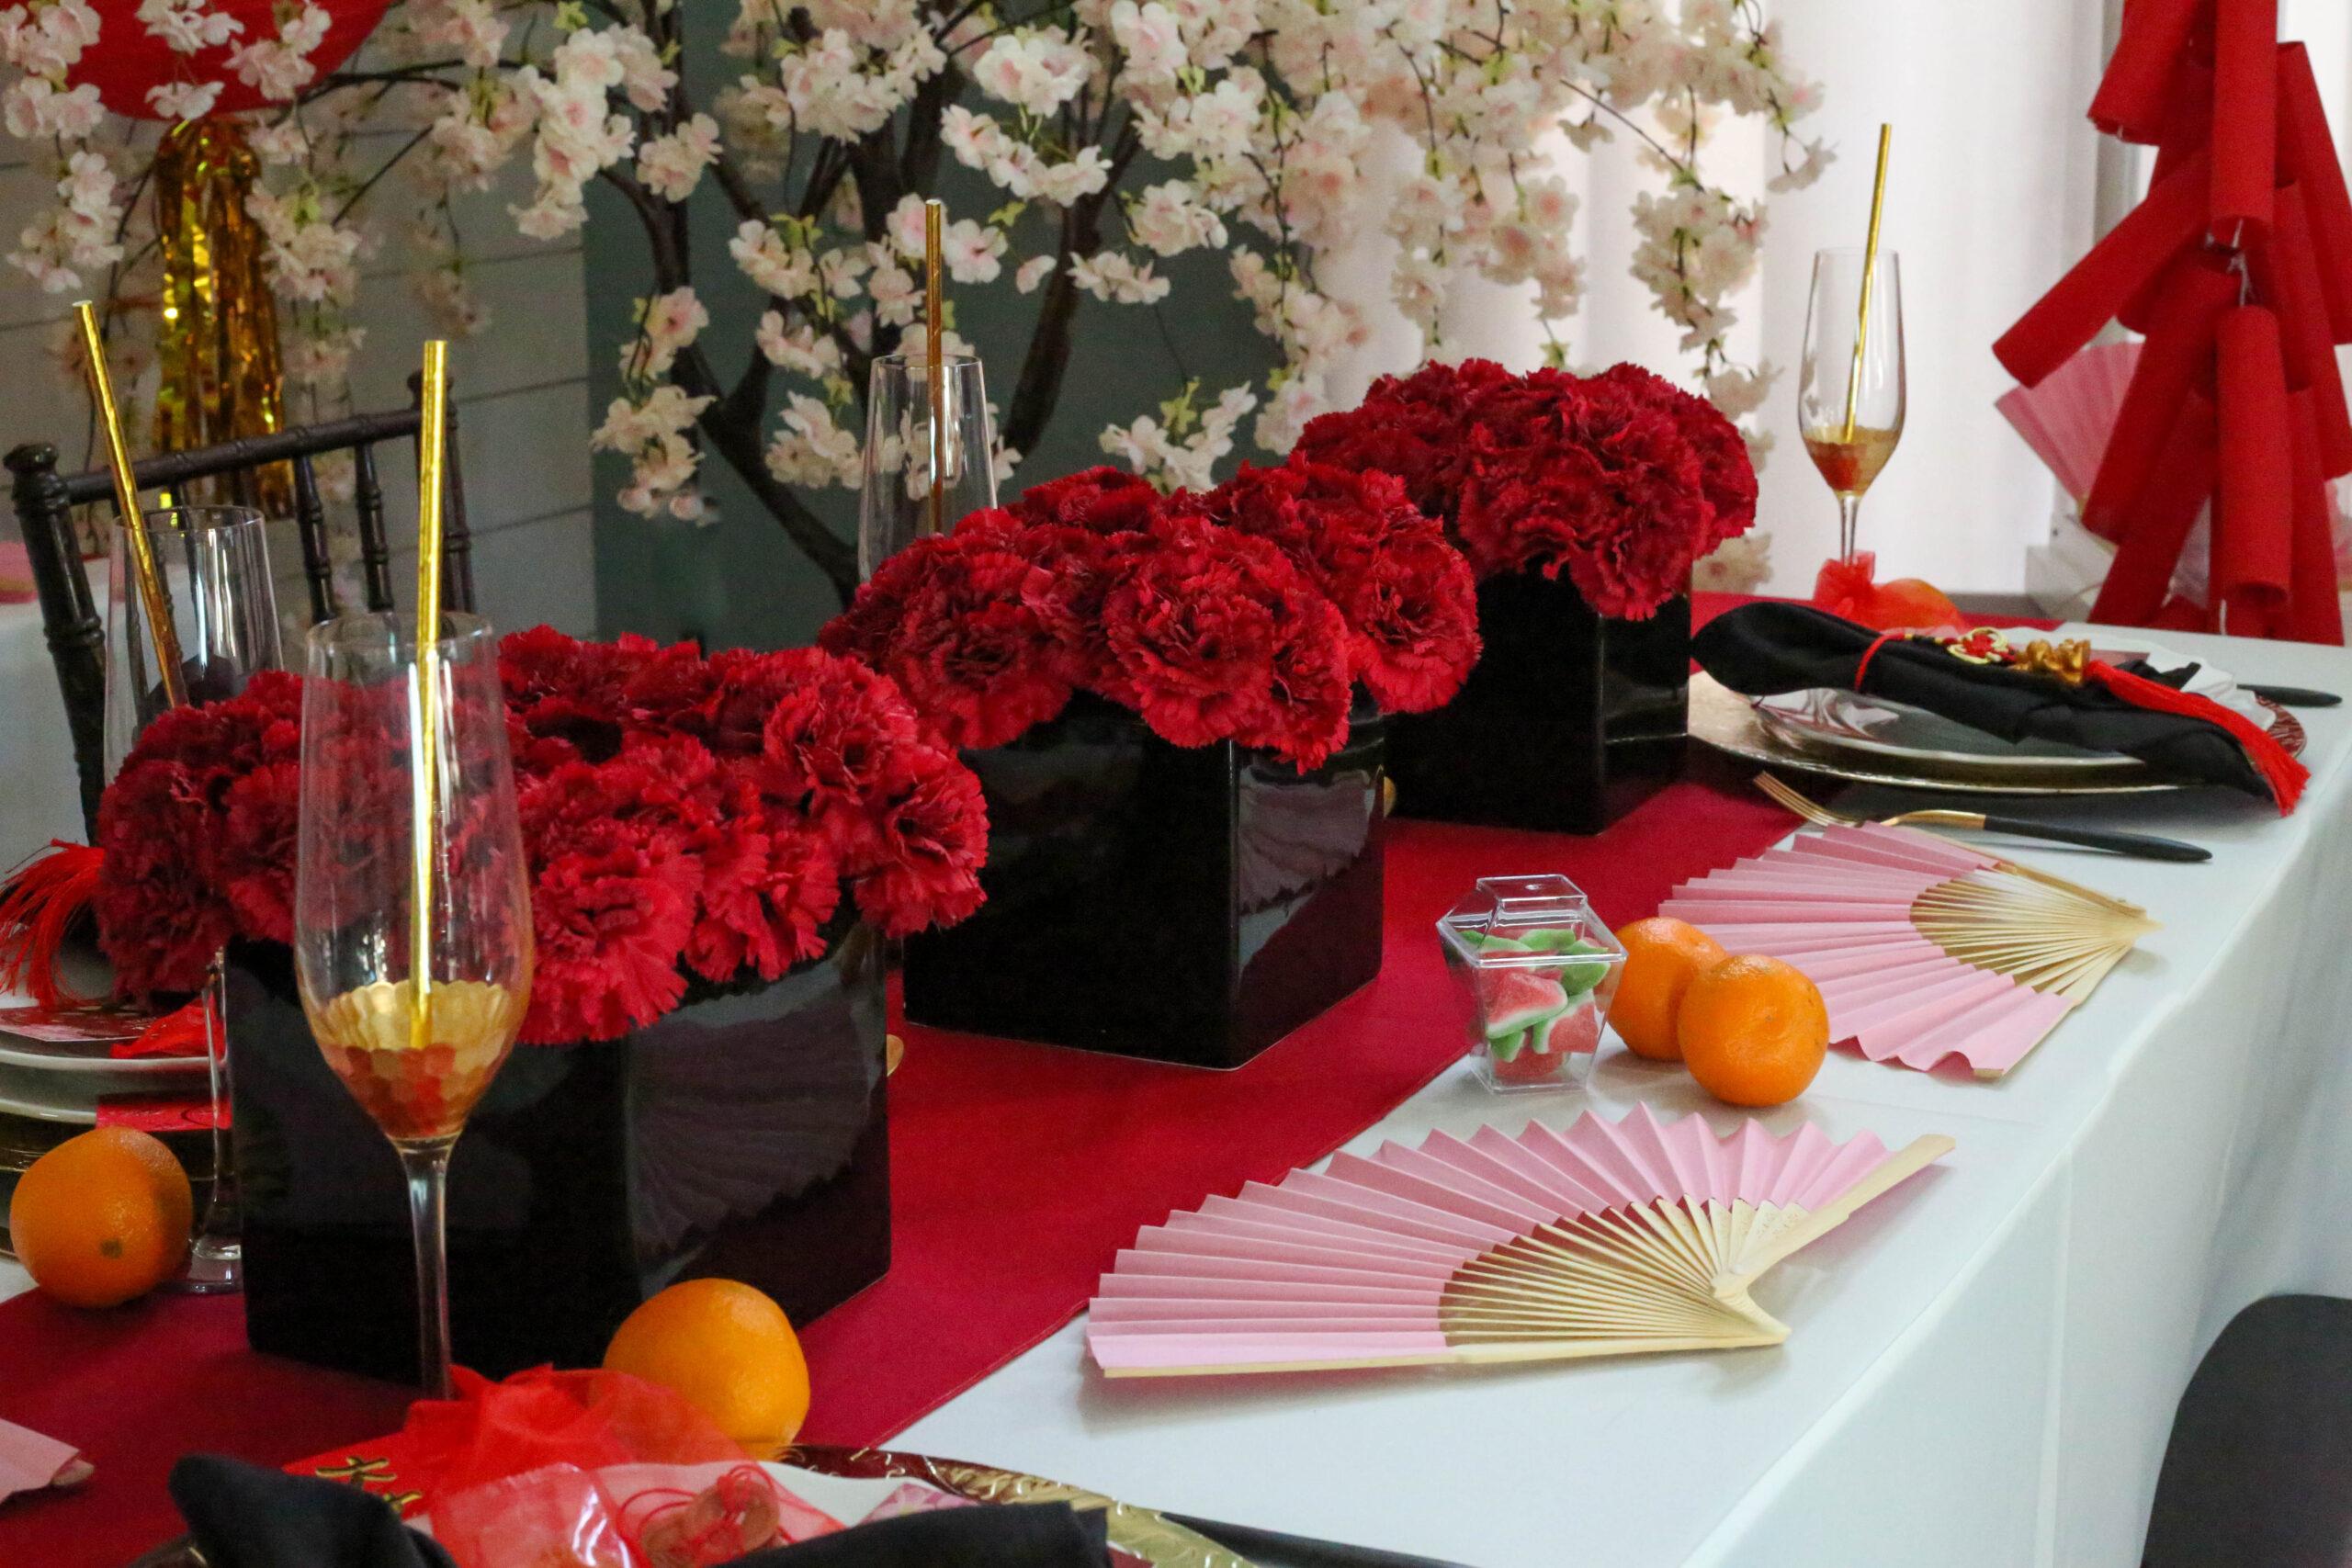 red carnation centerpiece vases